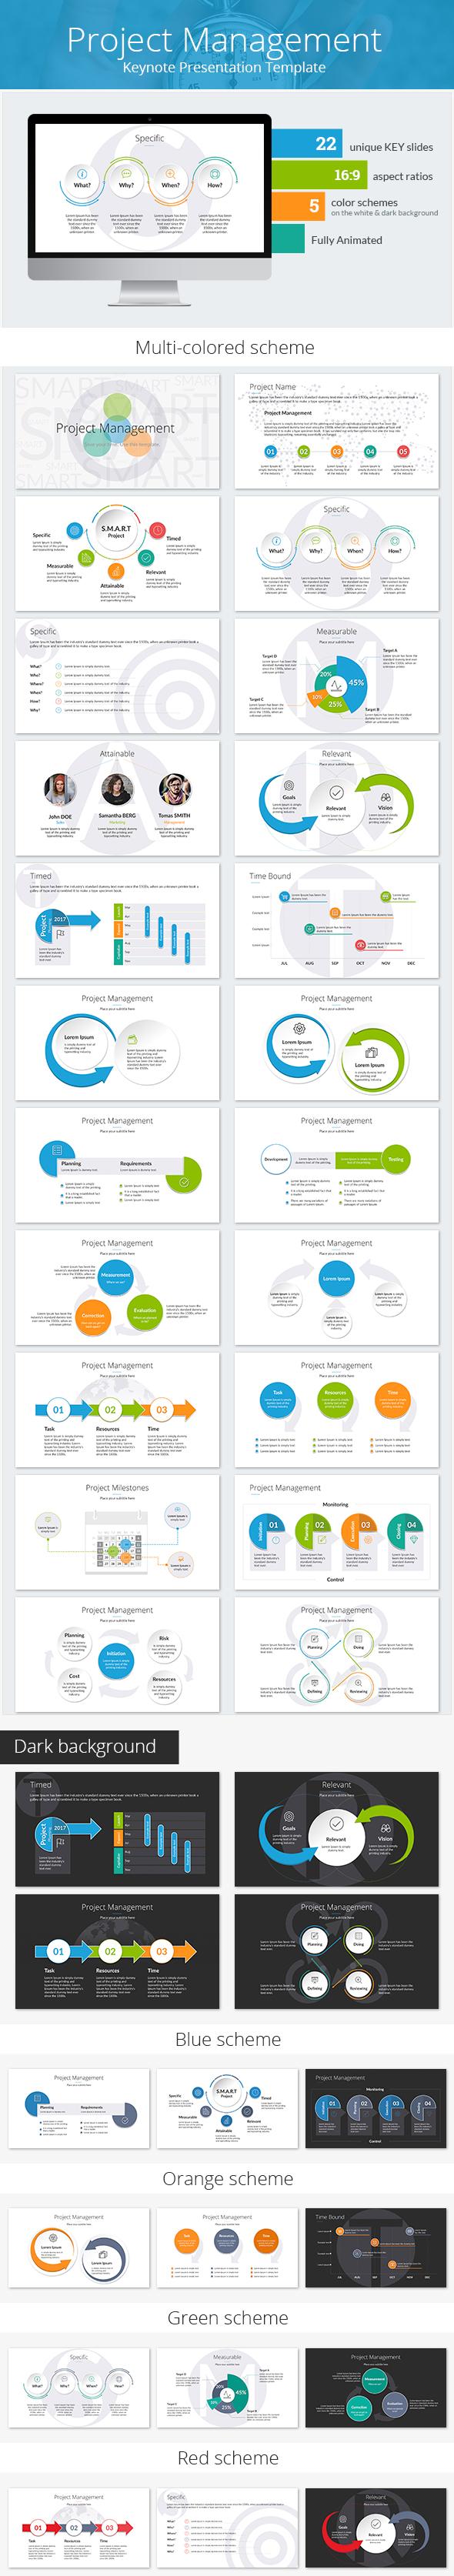 Project Management Keynote Presentation Template - Keynote Templates Presentation Templates